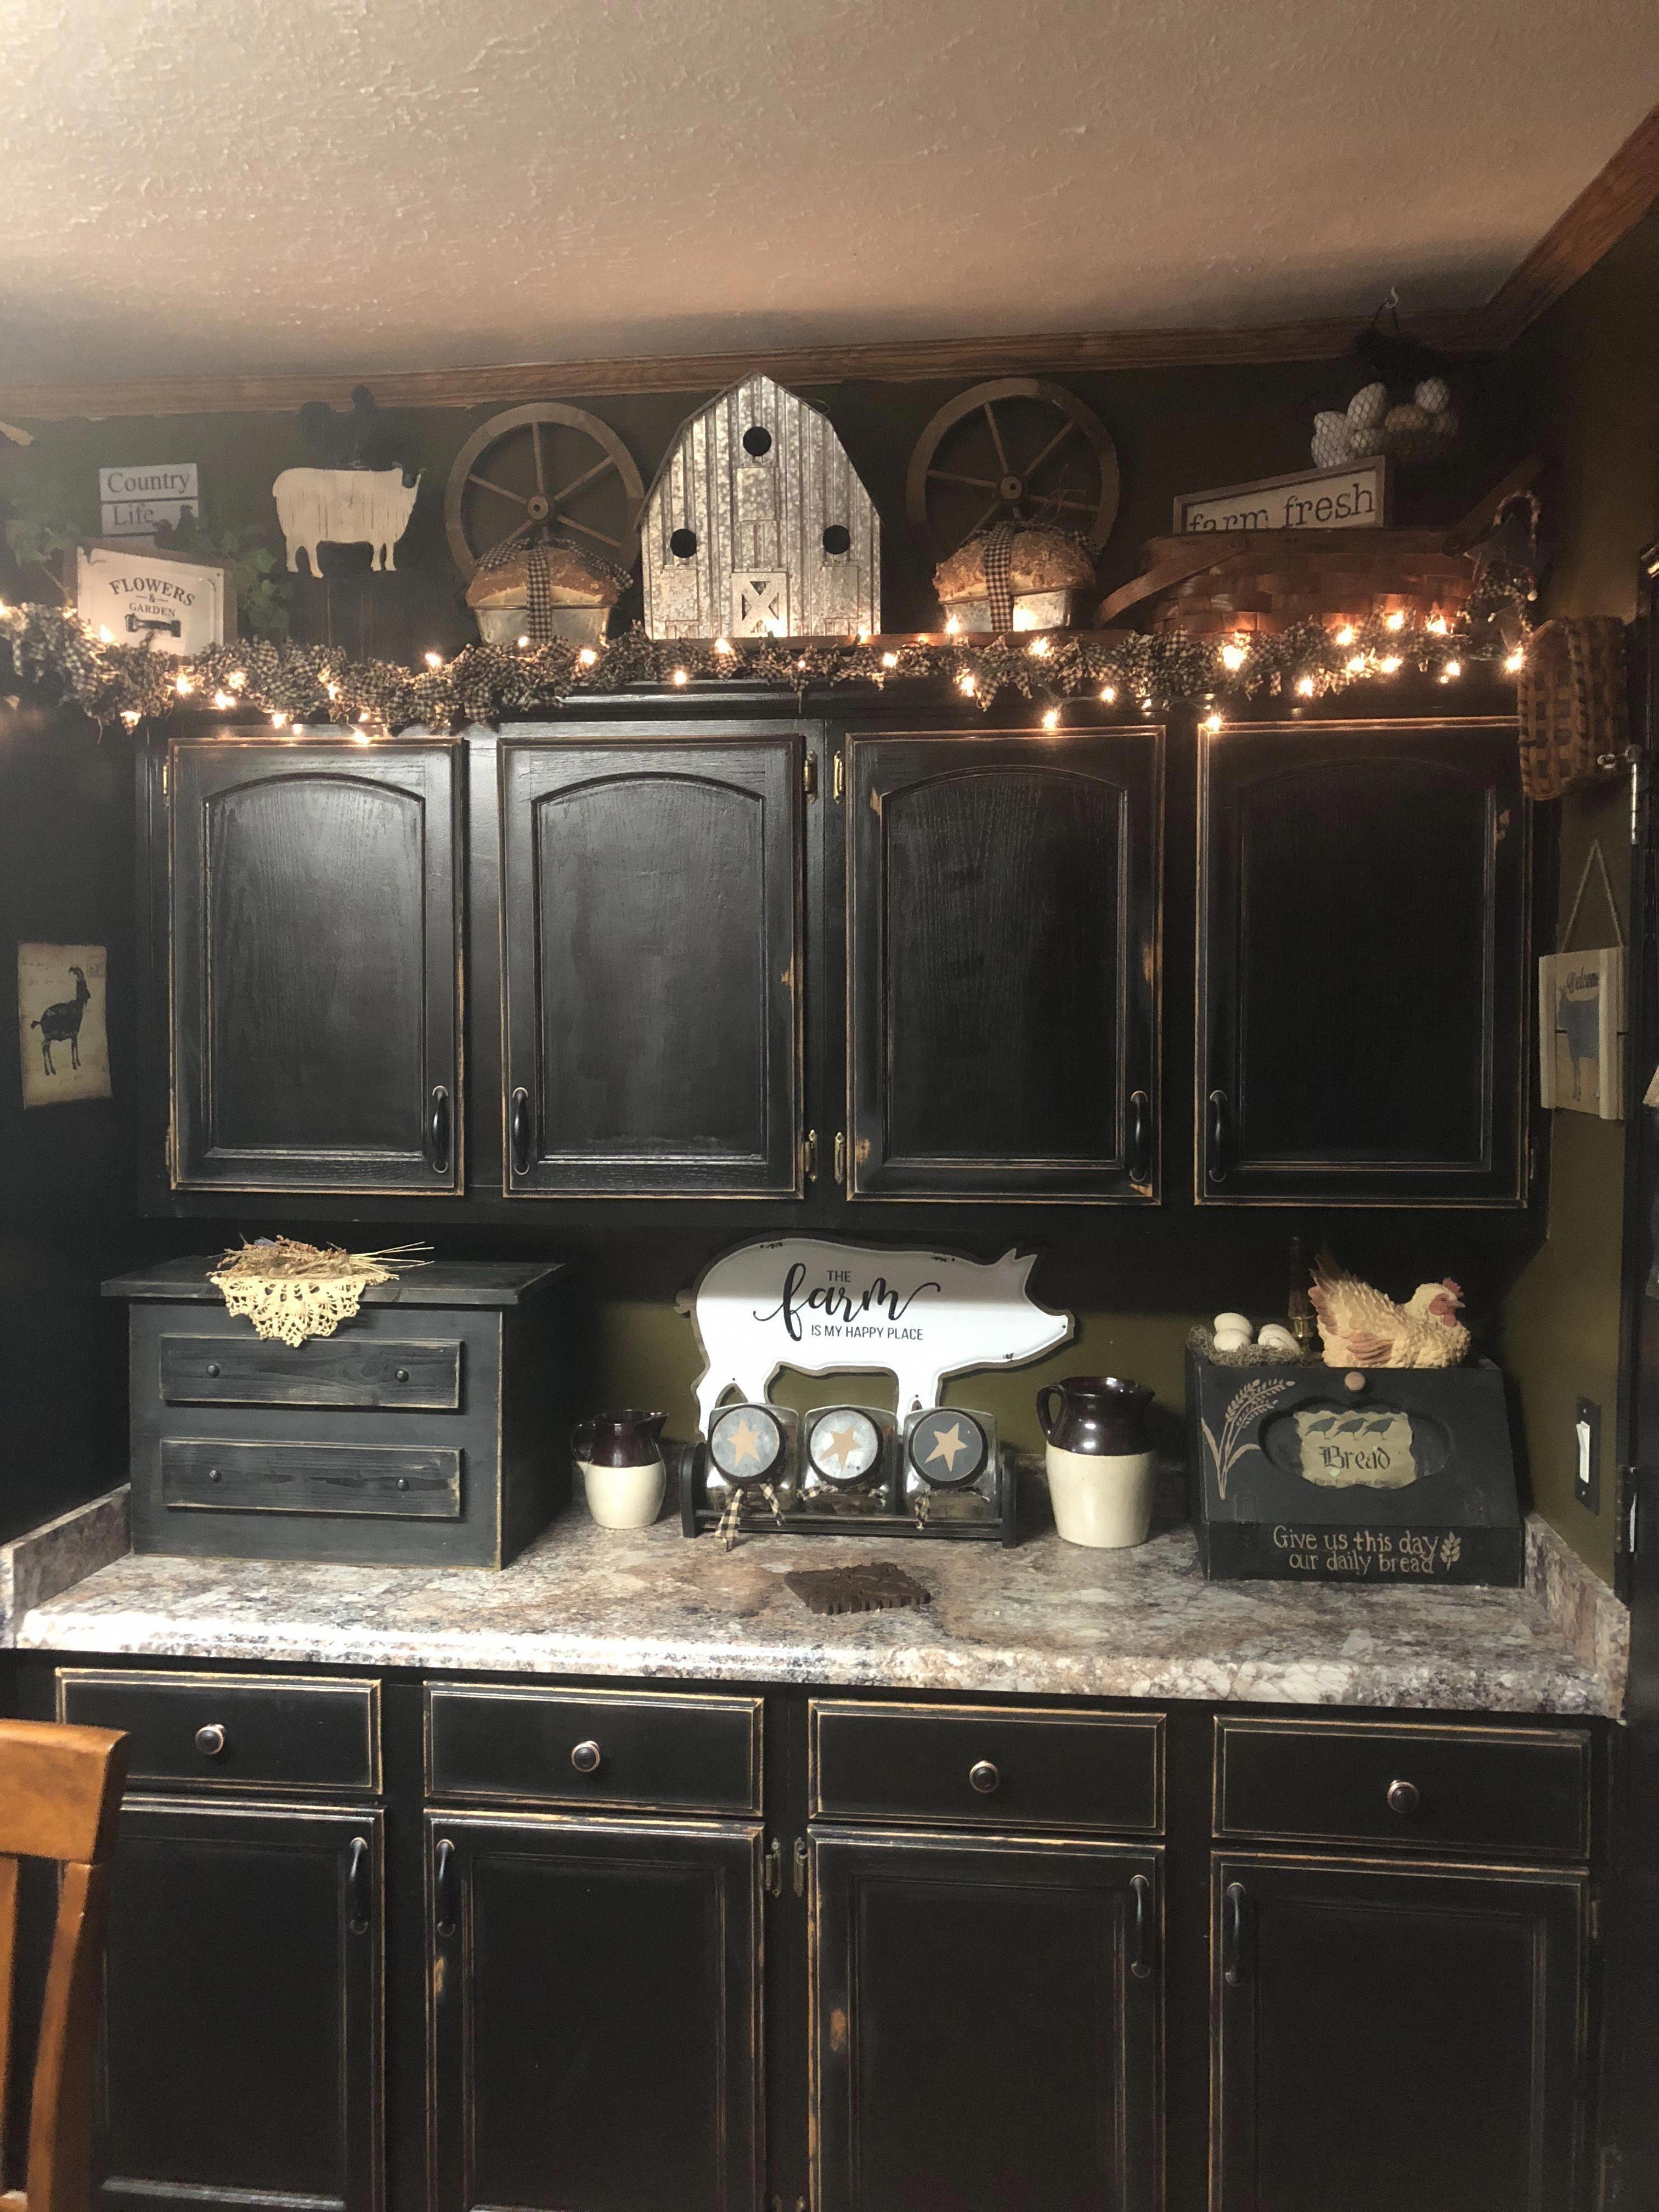 14 Kitchen Cabinet Accessories Ideas Tips On Selecting Kitchen Accessories In 2020 Primitive Kitchen Cabinets Primitive Kitchen Decor Black Kitchen Cabinets